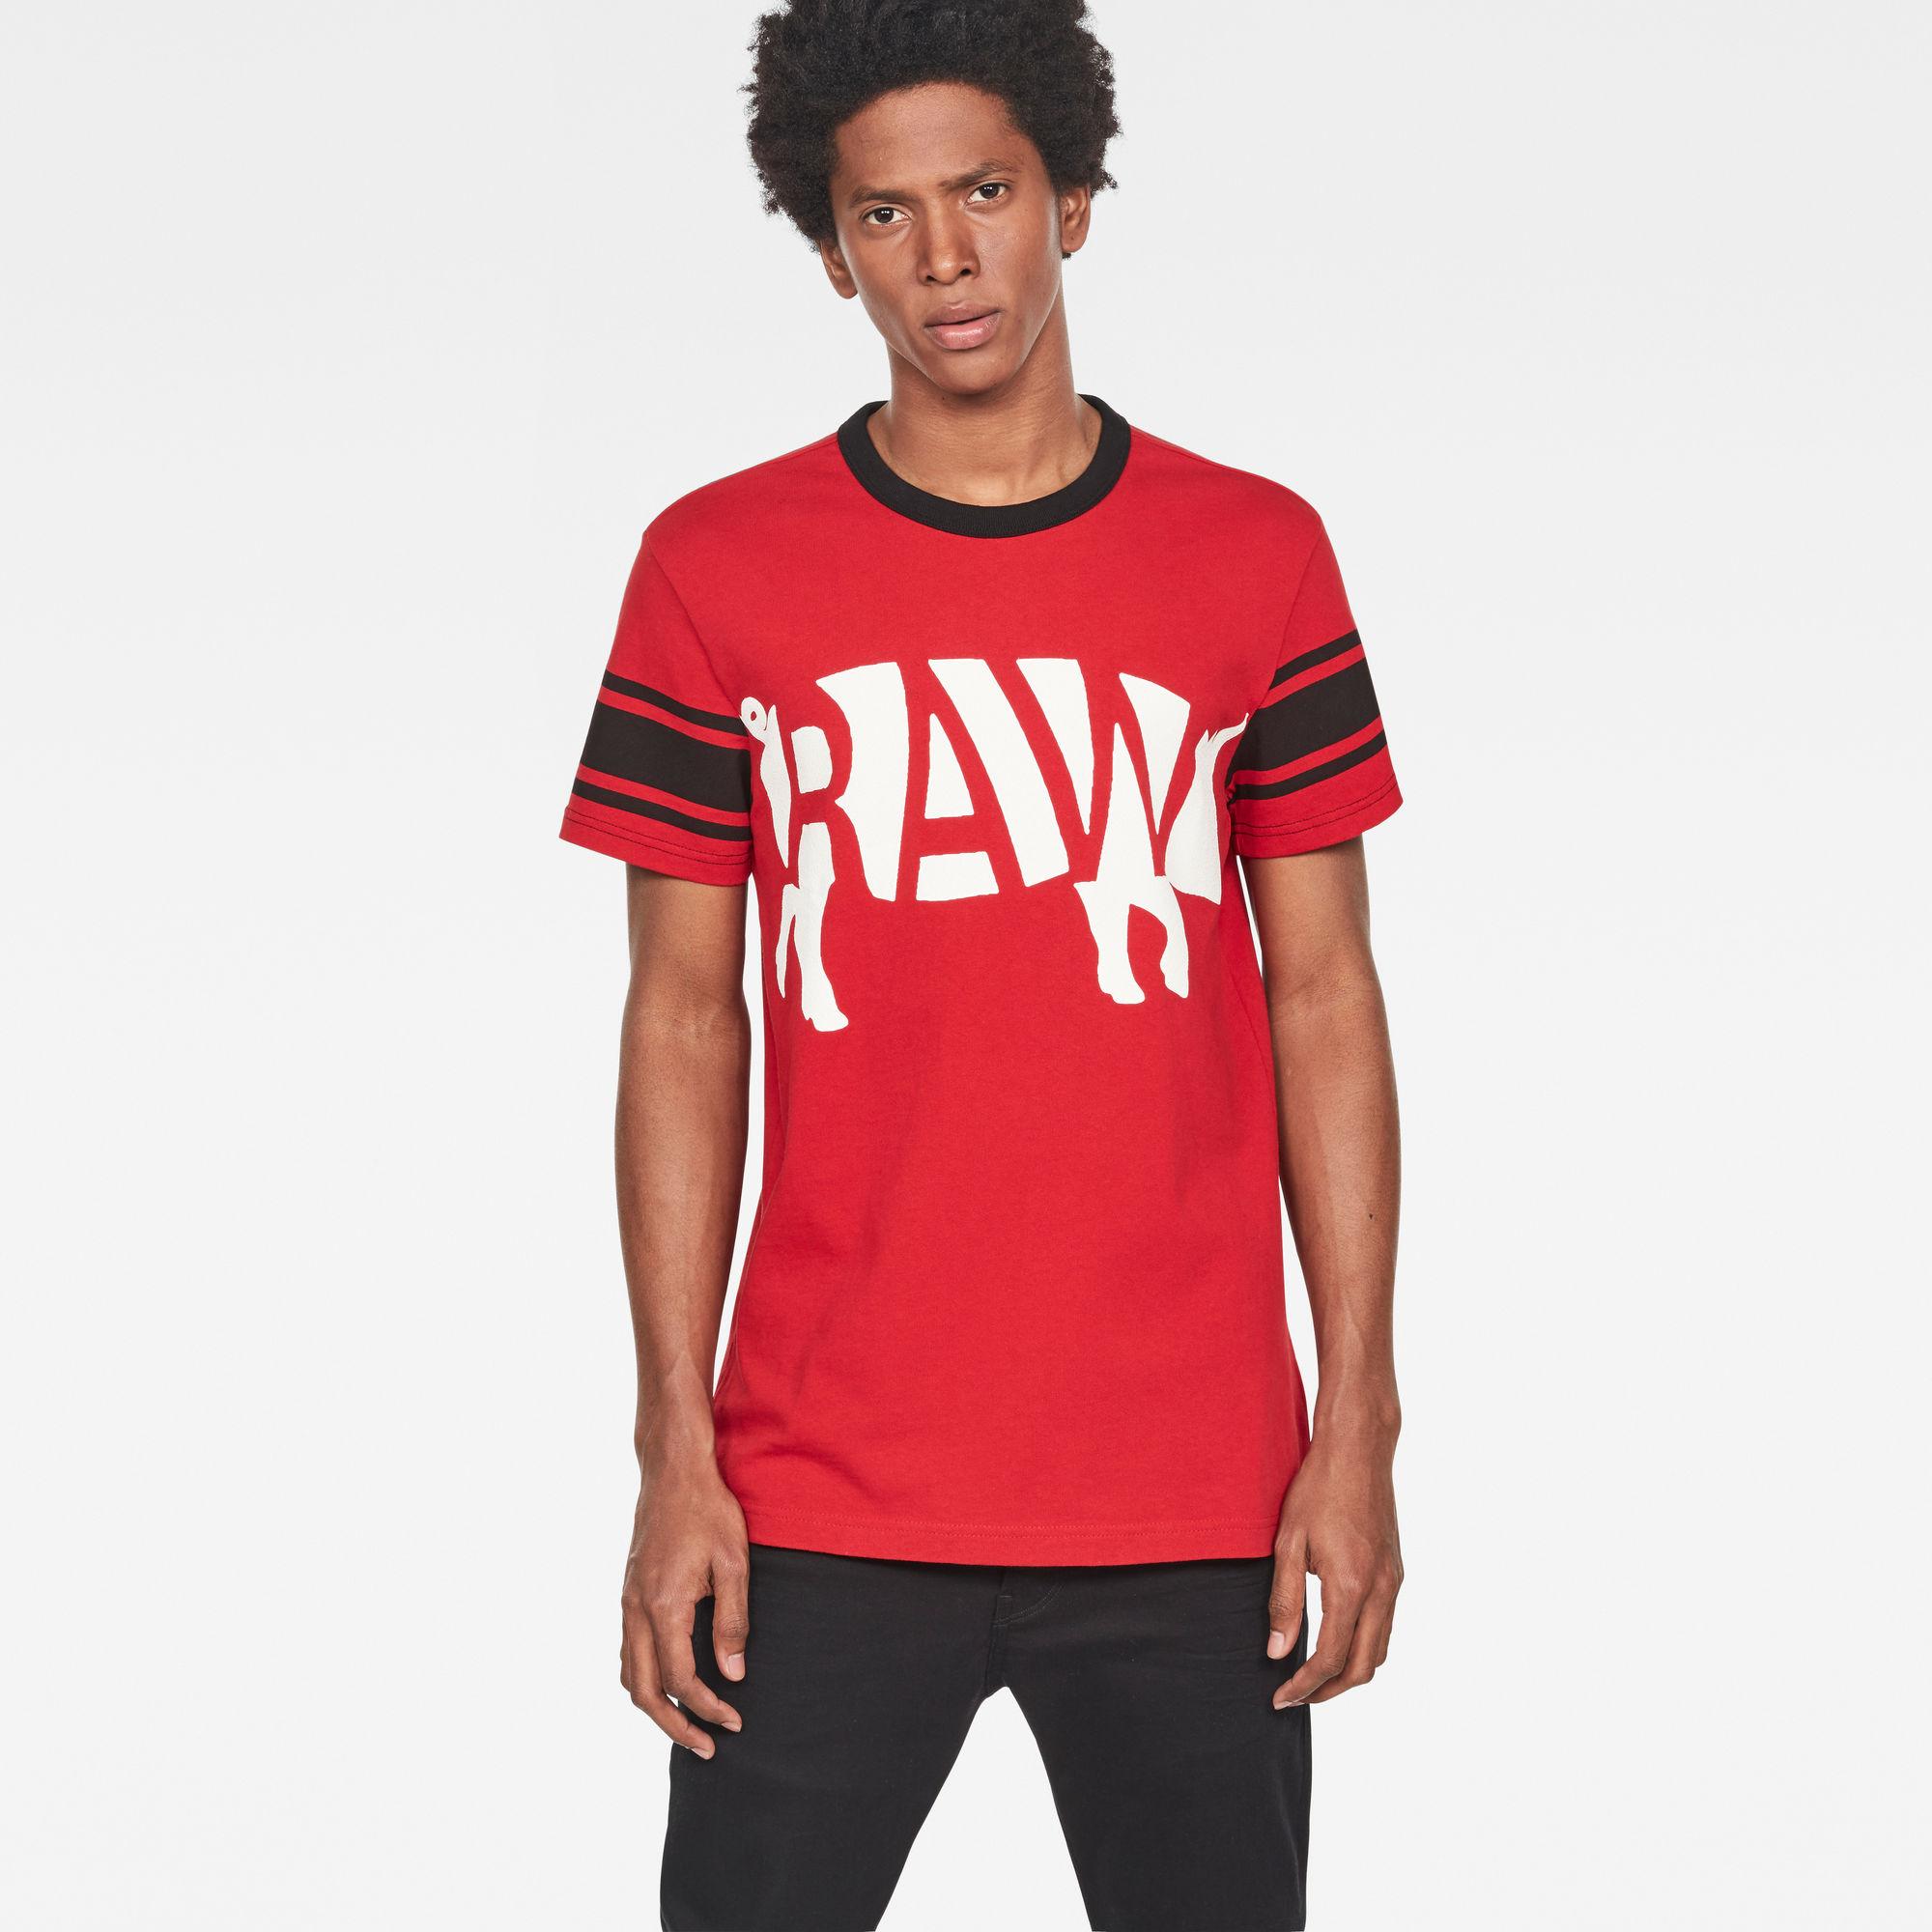 Image of G Star Raw Graphic 11 T-Shirt